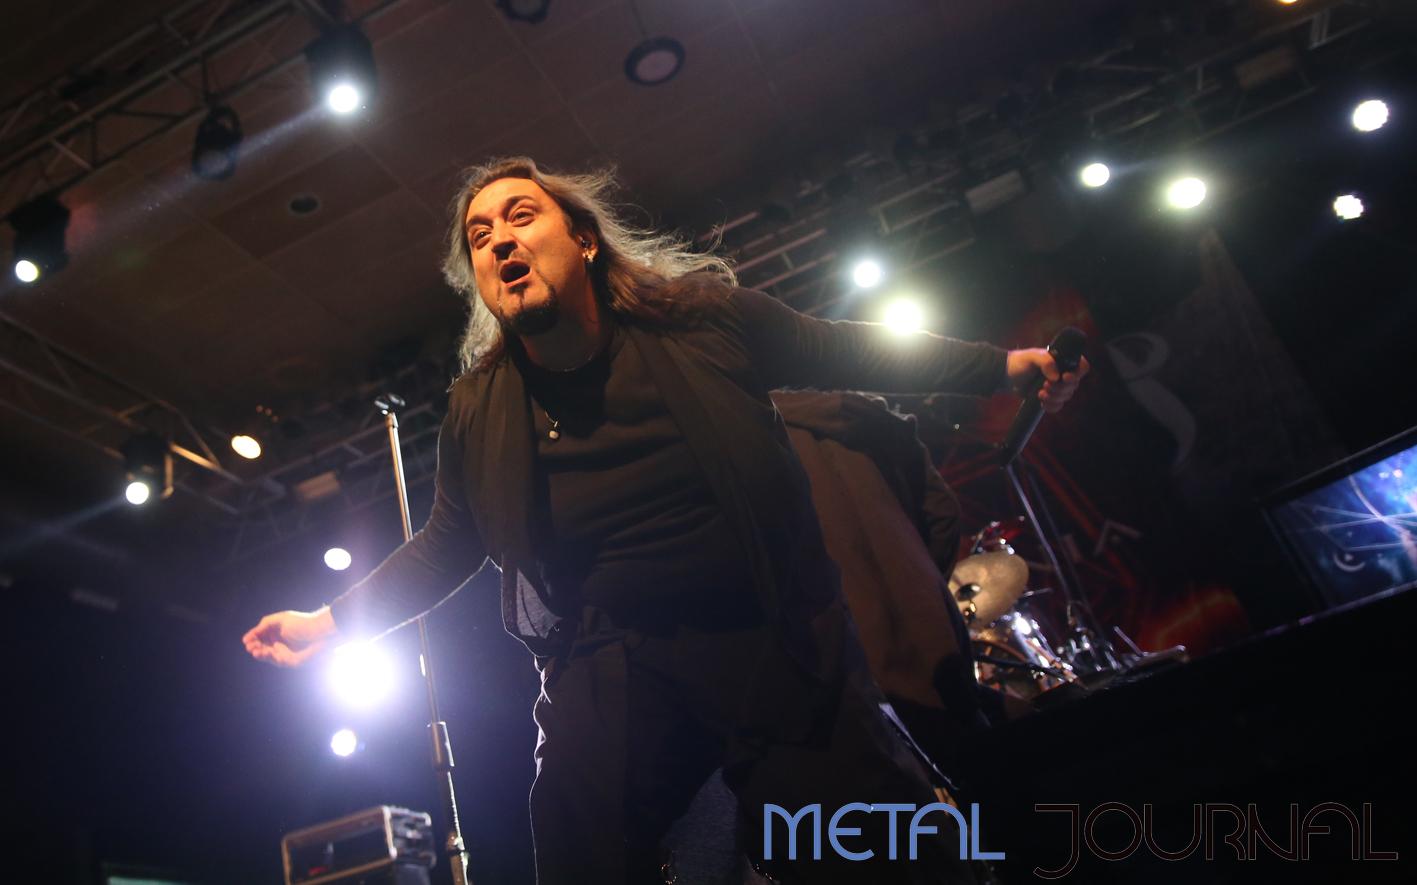 nocturnia bilbao 2019 metal journal pic 1